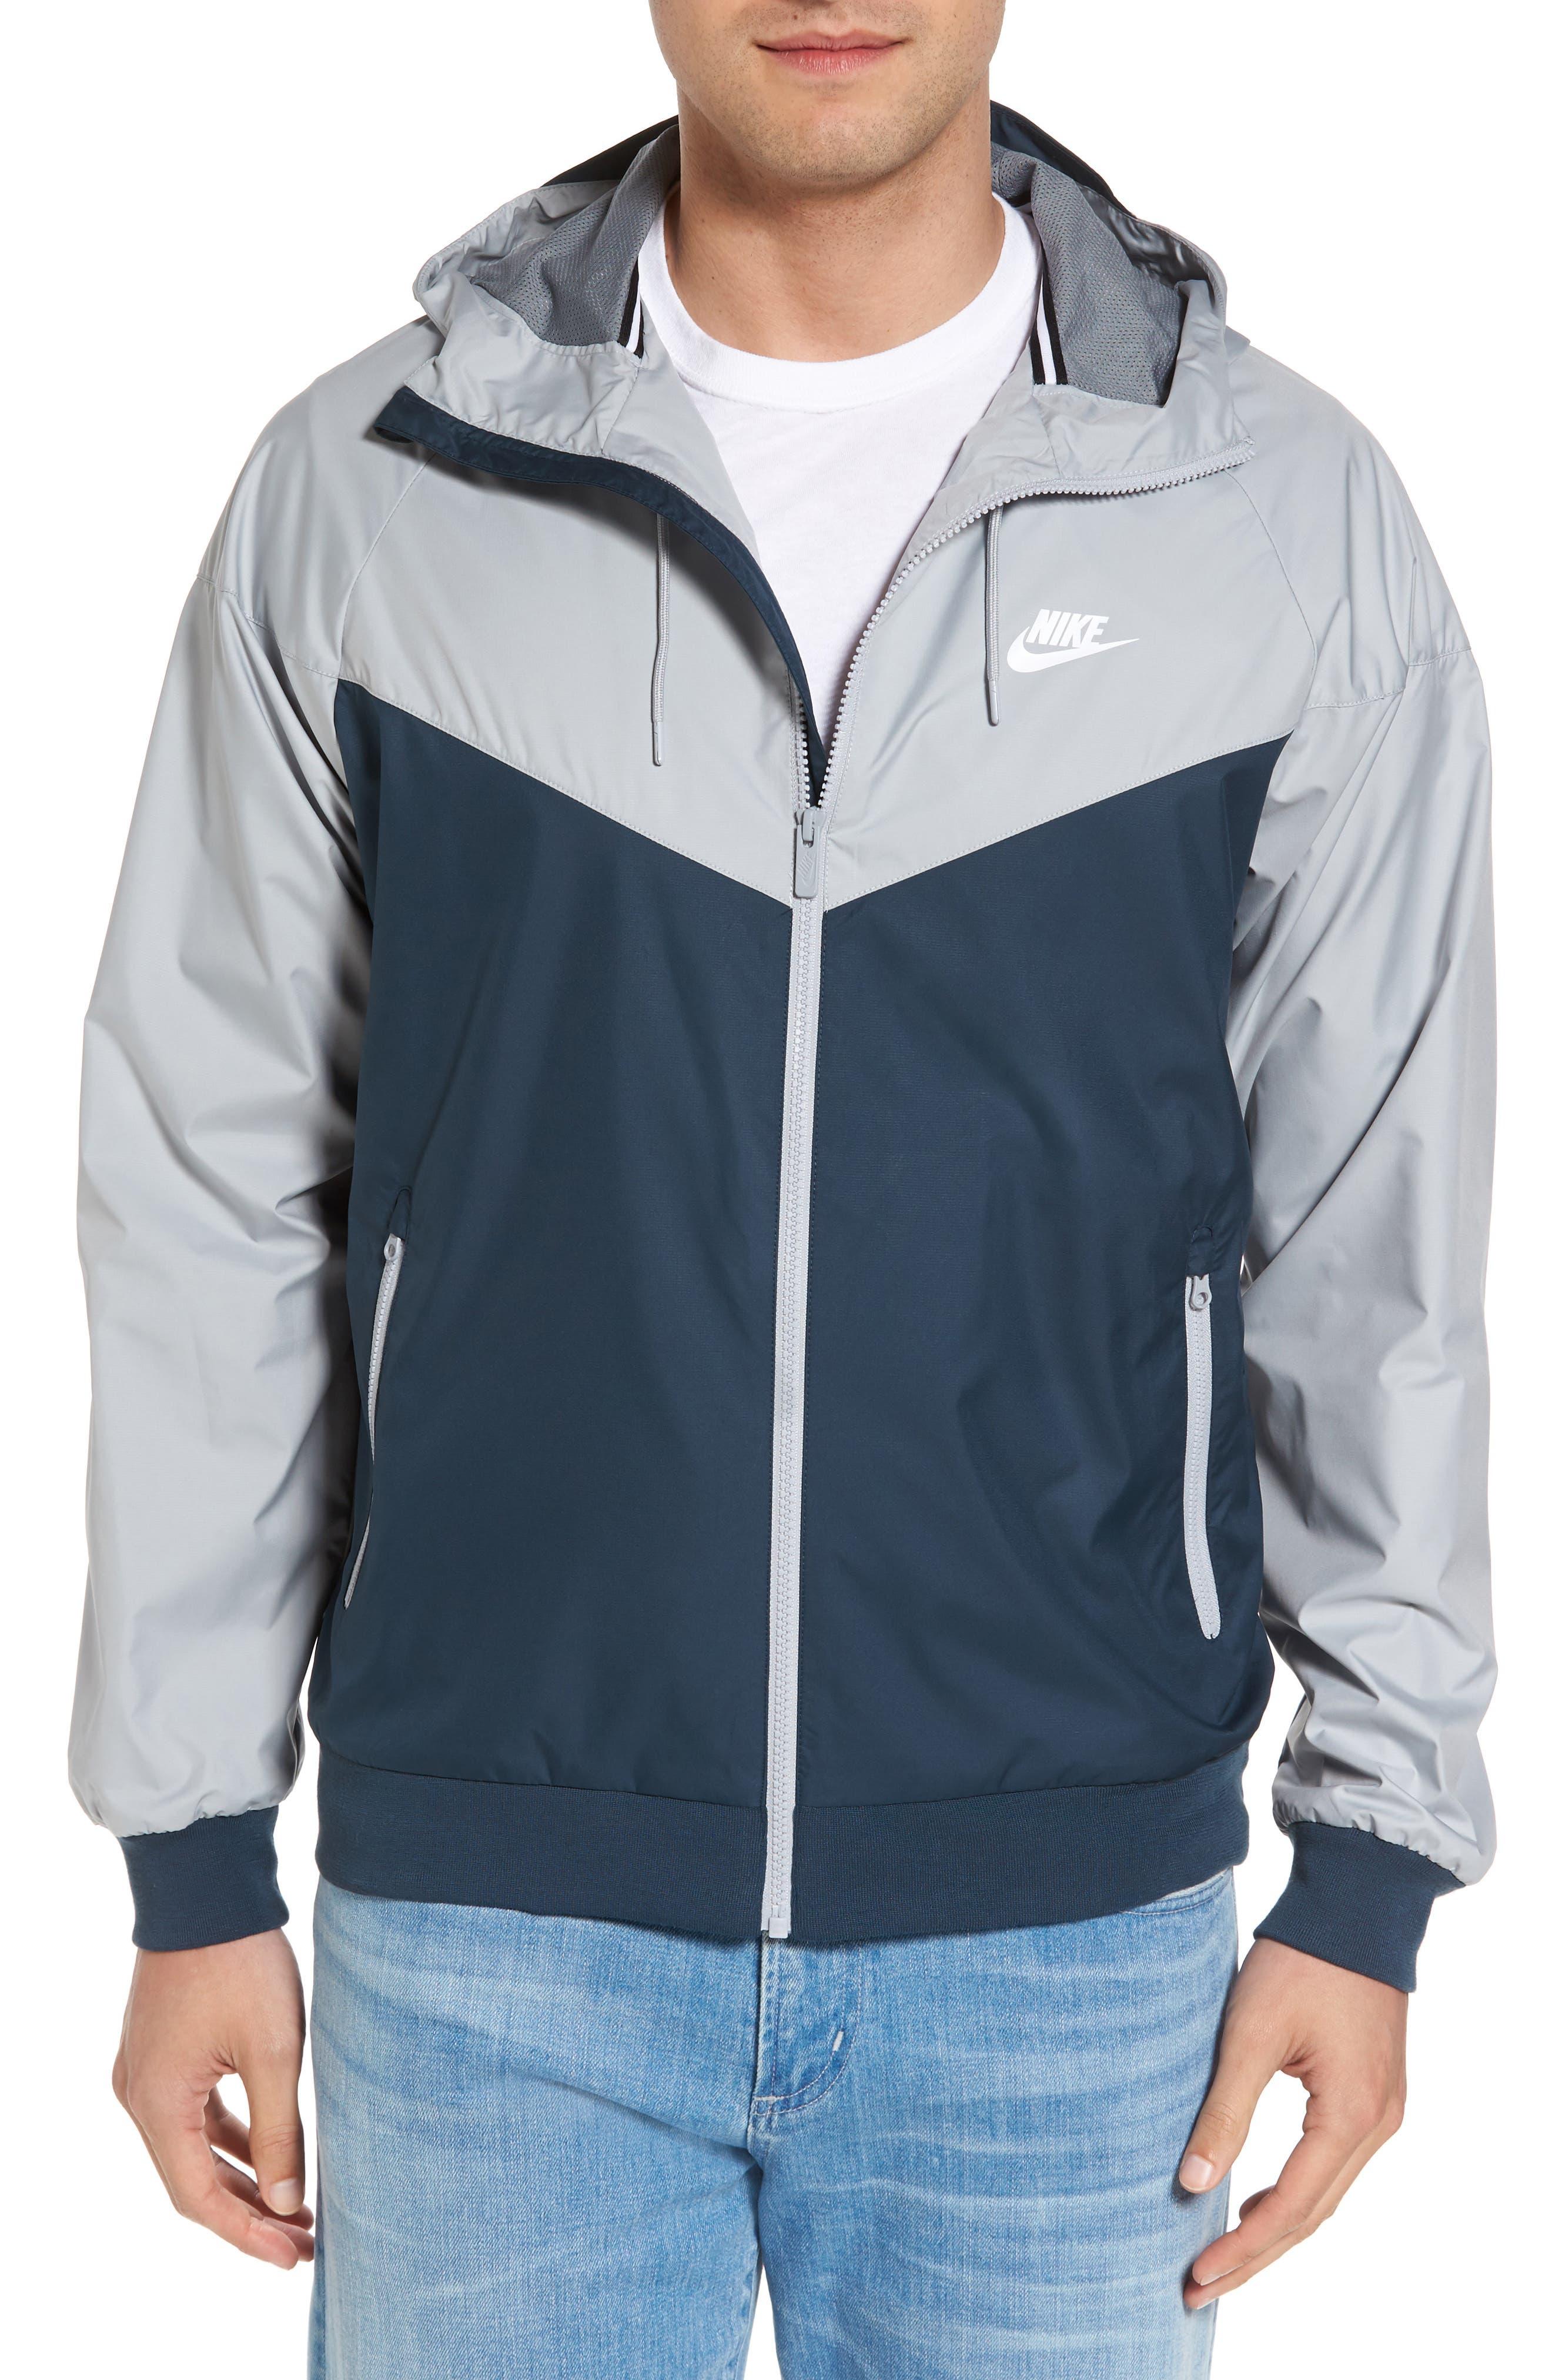 'Windrunner' Colorblock Jacket,                             Main thumbnail 1, color,                             GREY/ BLUE